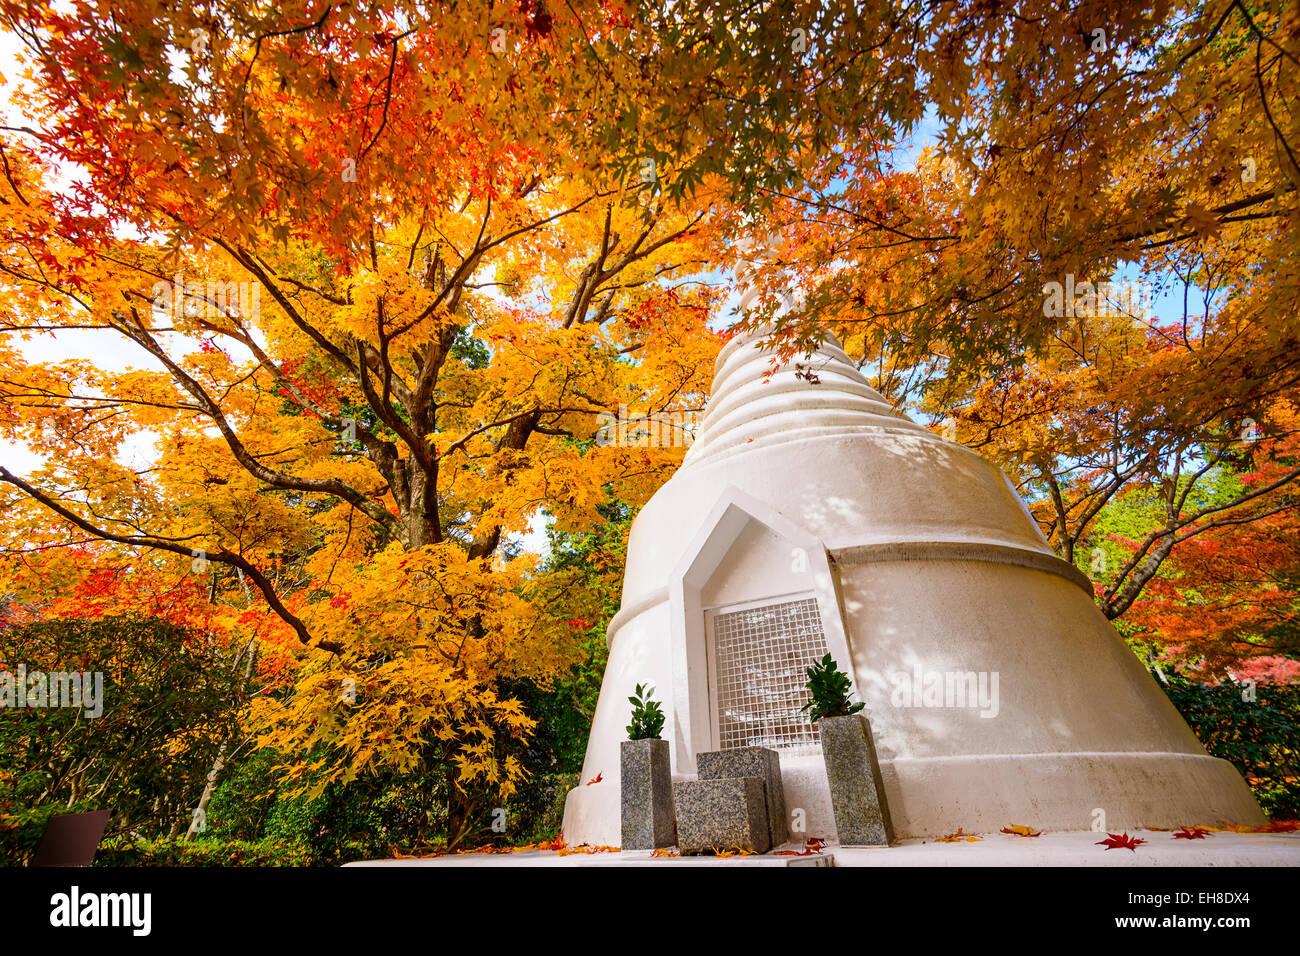 Pagoda during the fall at Ryoan-ji Temple in Kyoto, Japan. - Stock Image